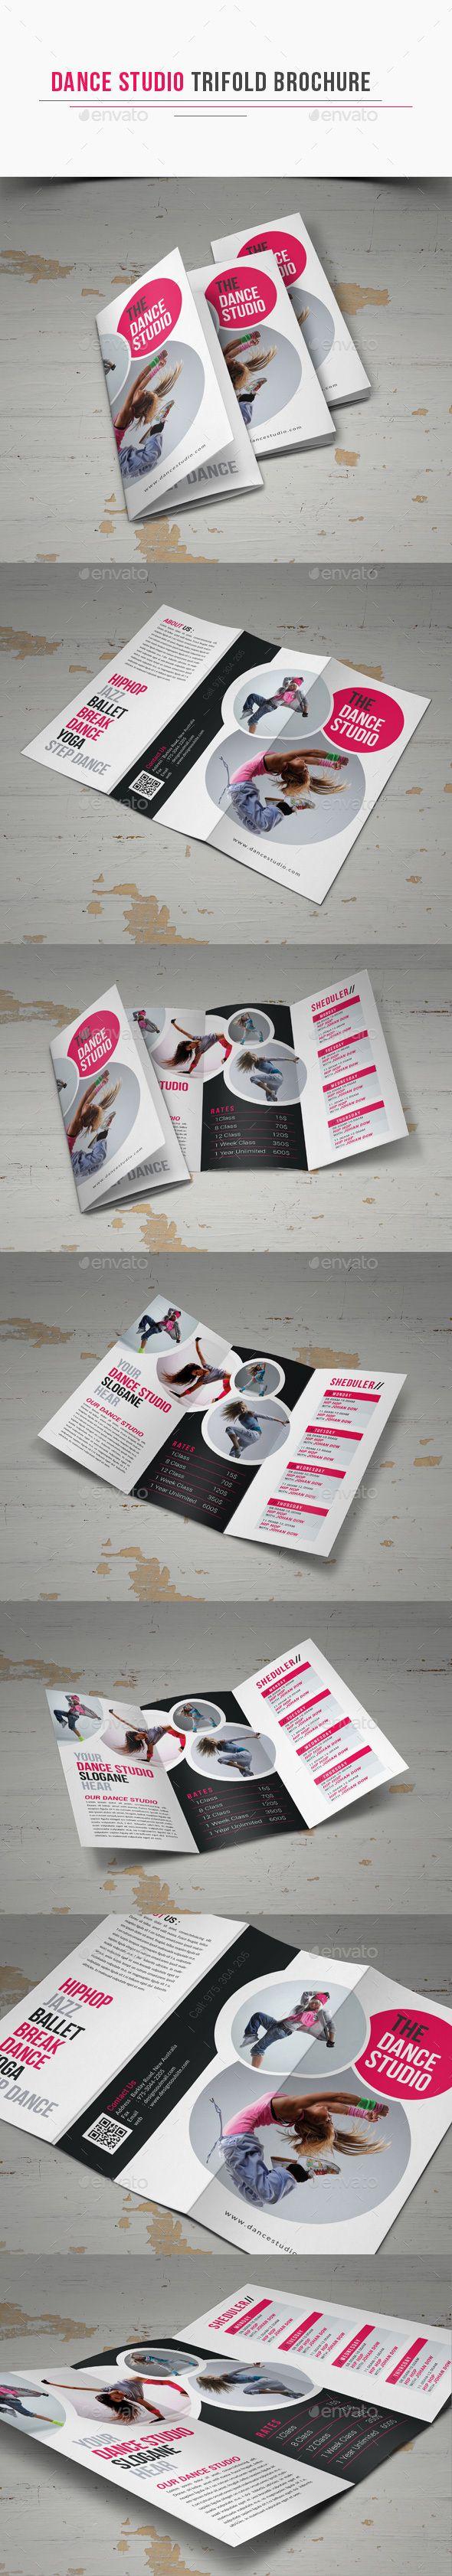 Dance Studio Trifold Brochure Template PSD